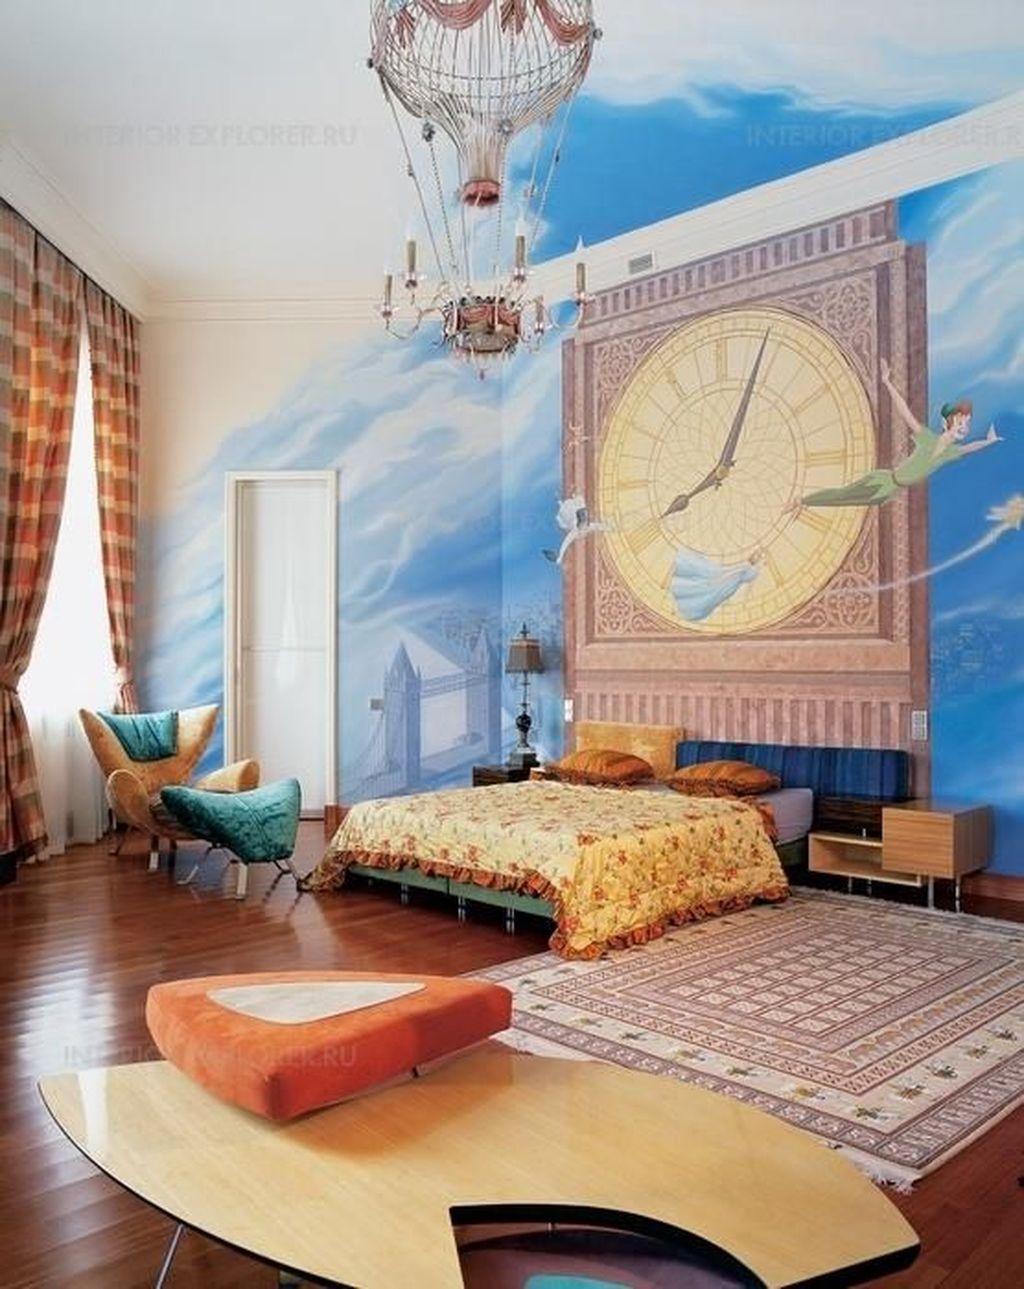 Adorable Disney Room Design Ideas For Your Childrens Room 02